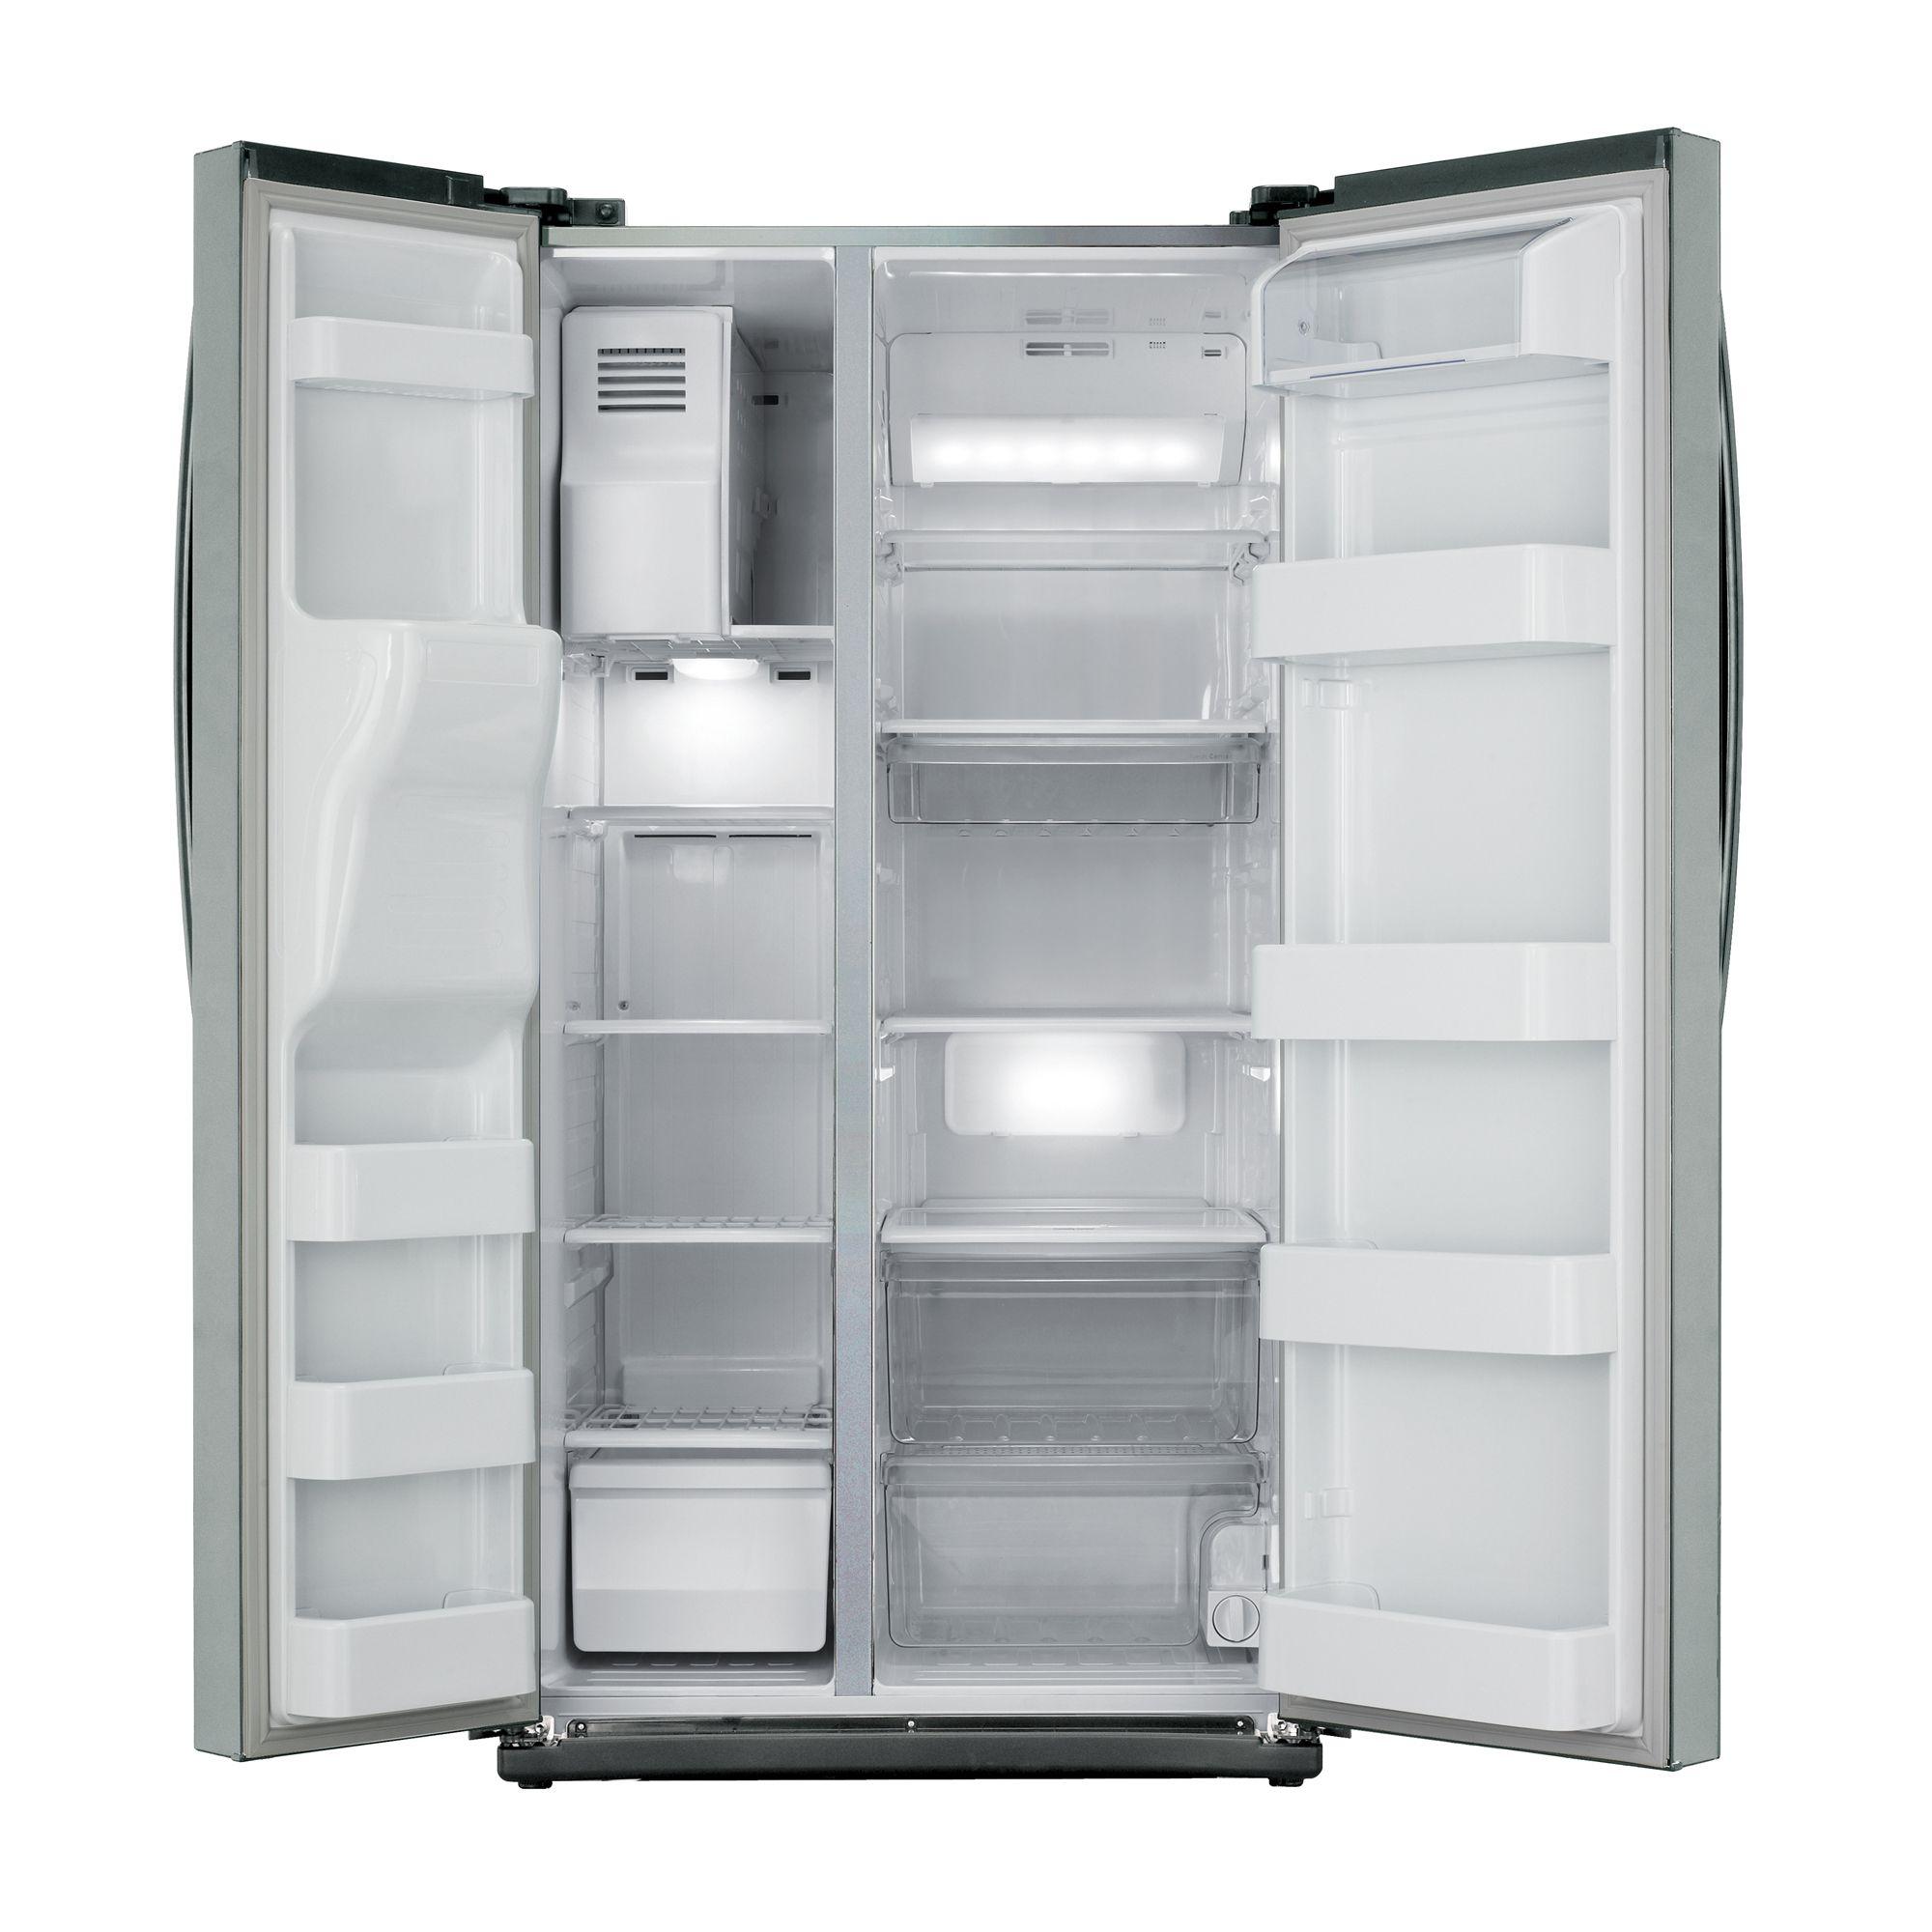 Samsung RS261MDAS Side by Side Refrigerator